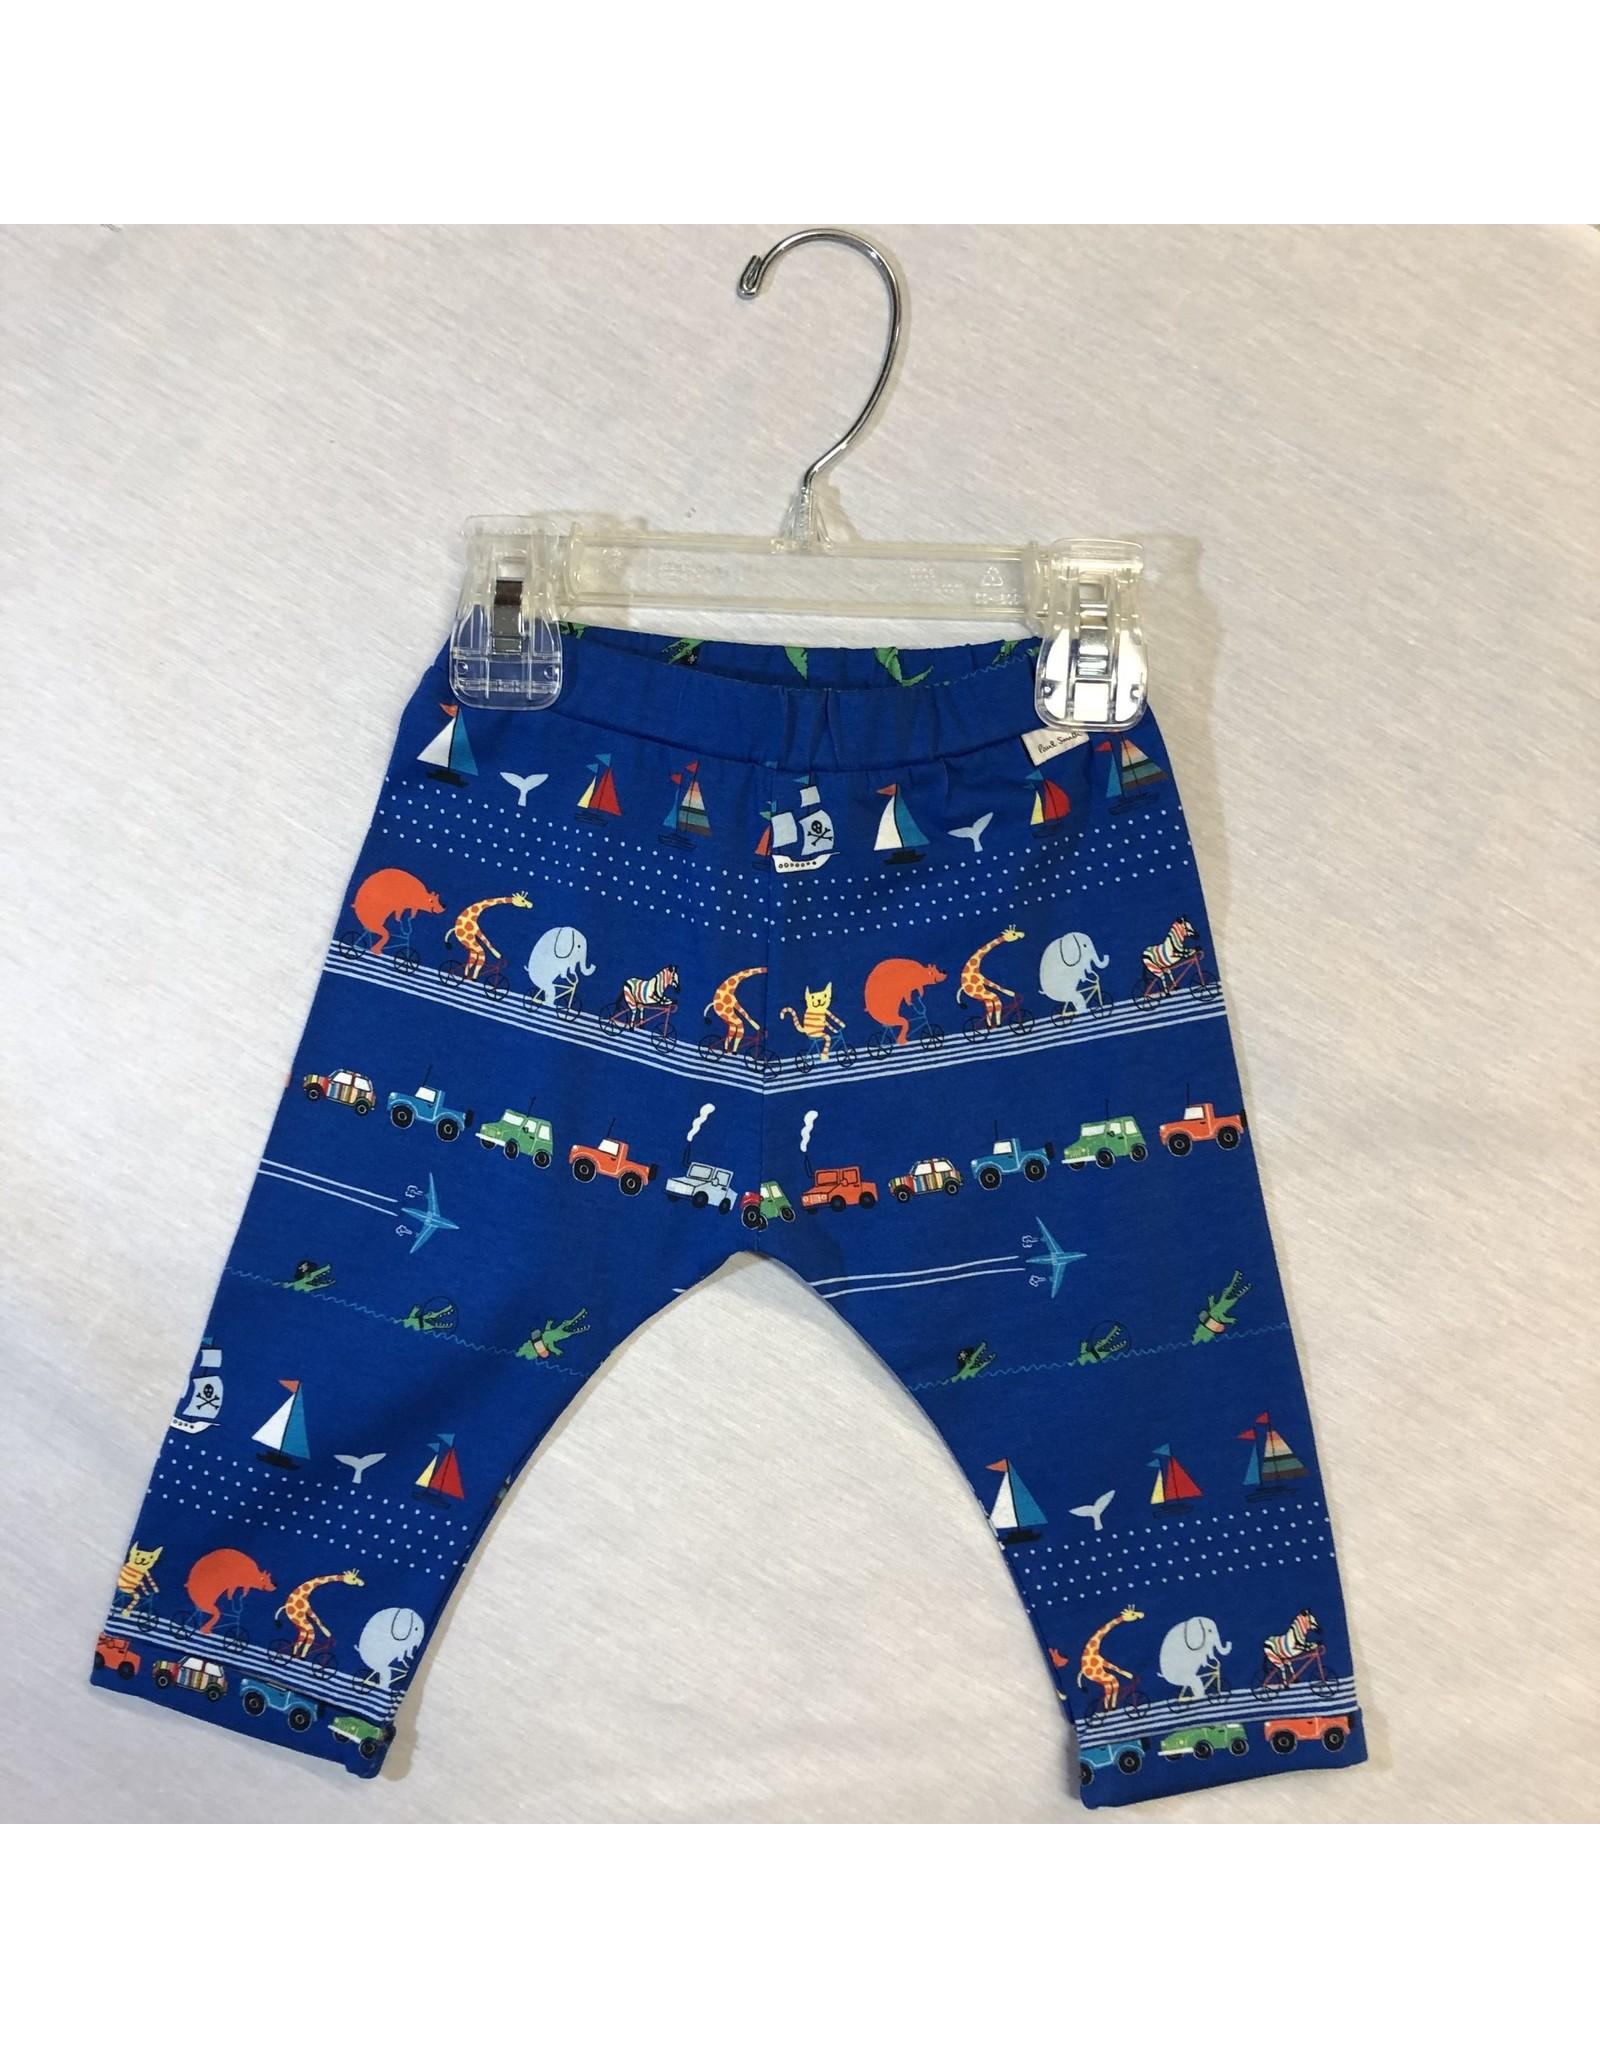 Paul Smith Animal Boating Pants